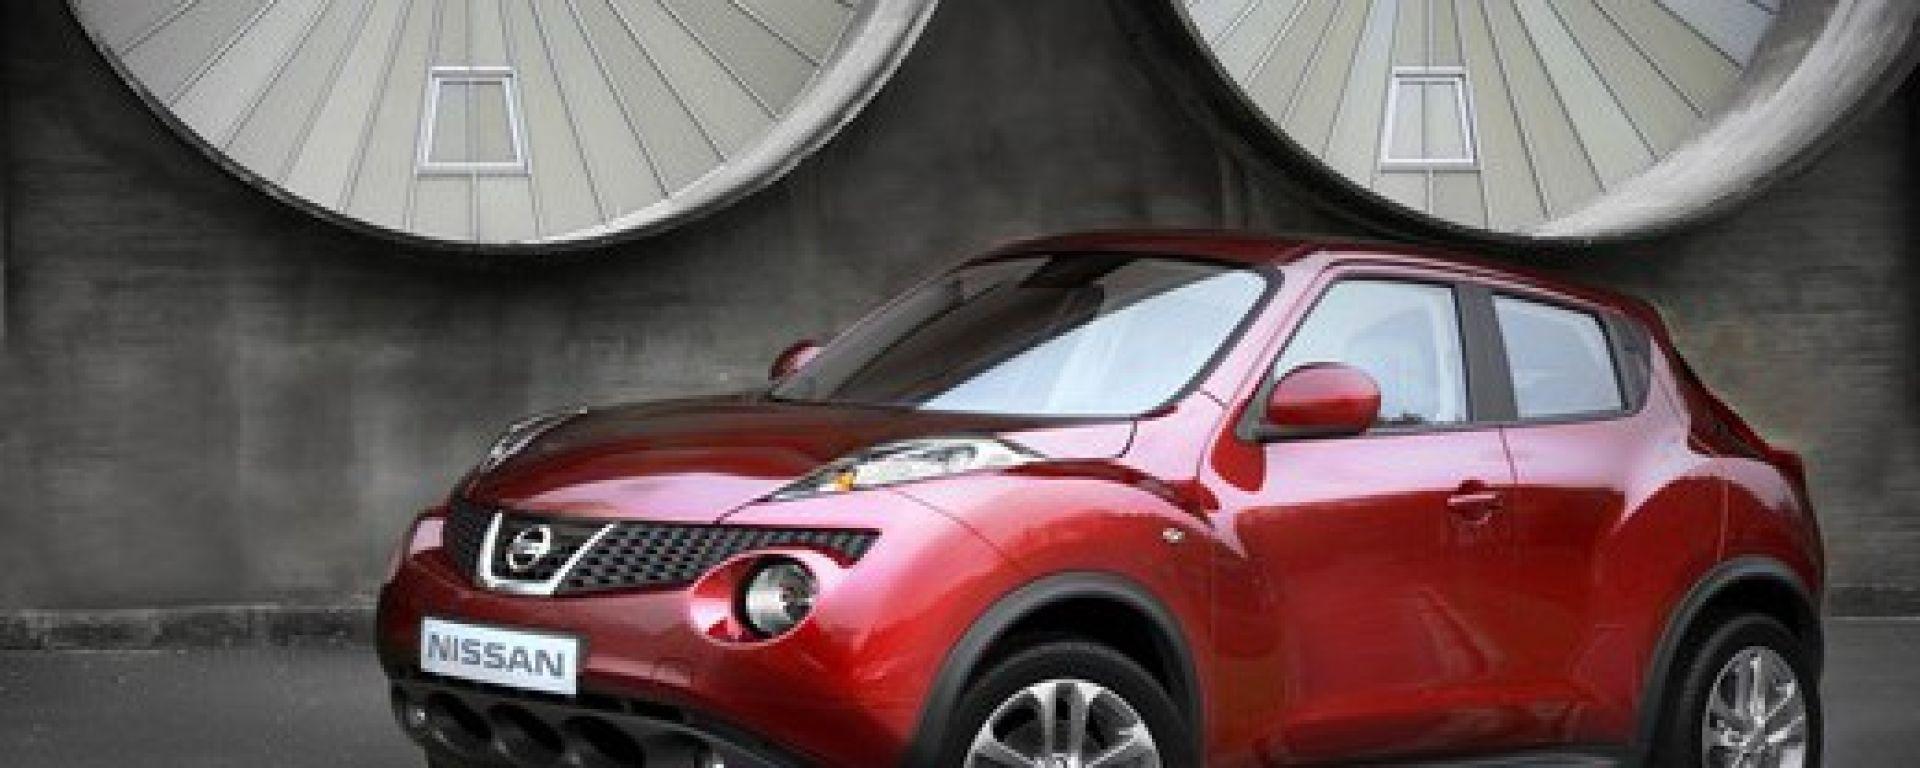 Schemi Elettrici Nissan : Prova nissan juke motorbox